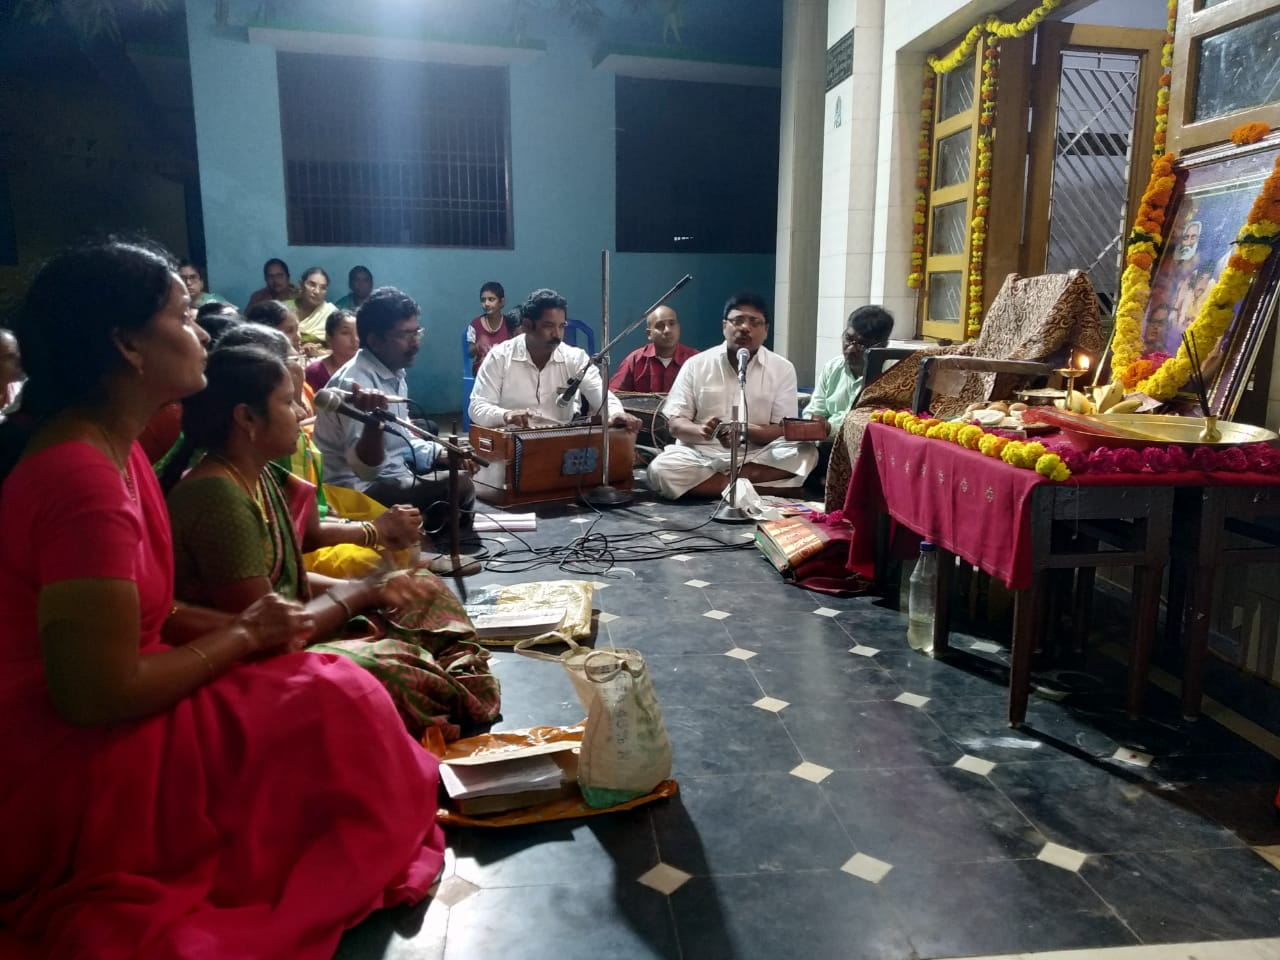 10-KarthikaMasam-Aaradhana-Aacchampeta-27112019